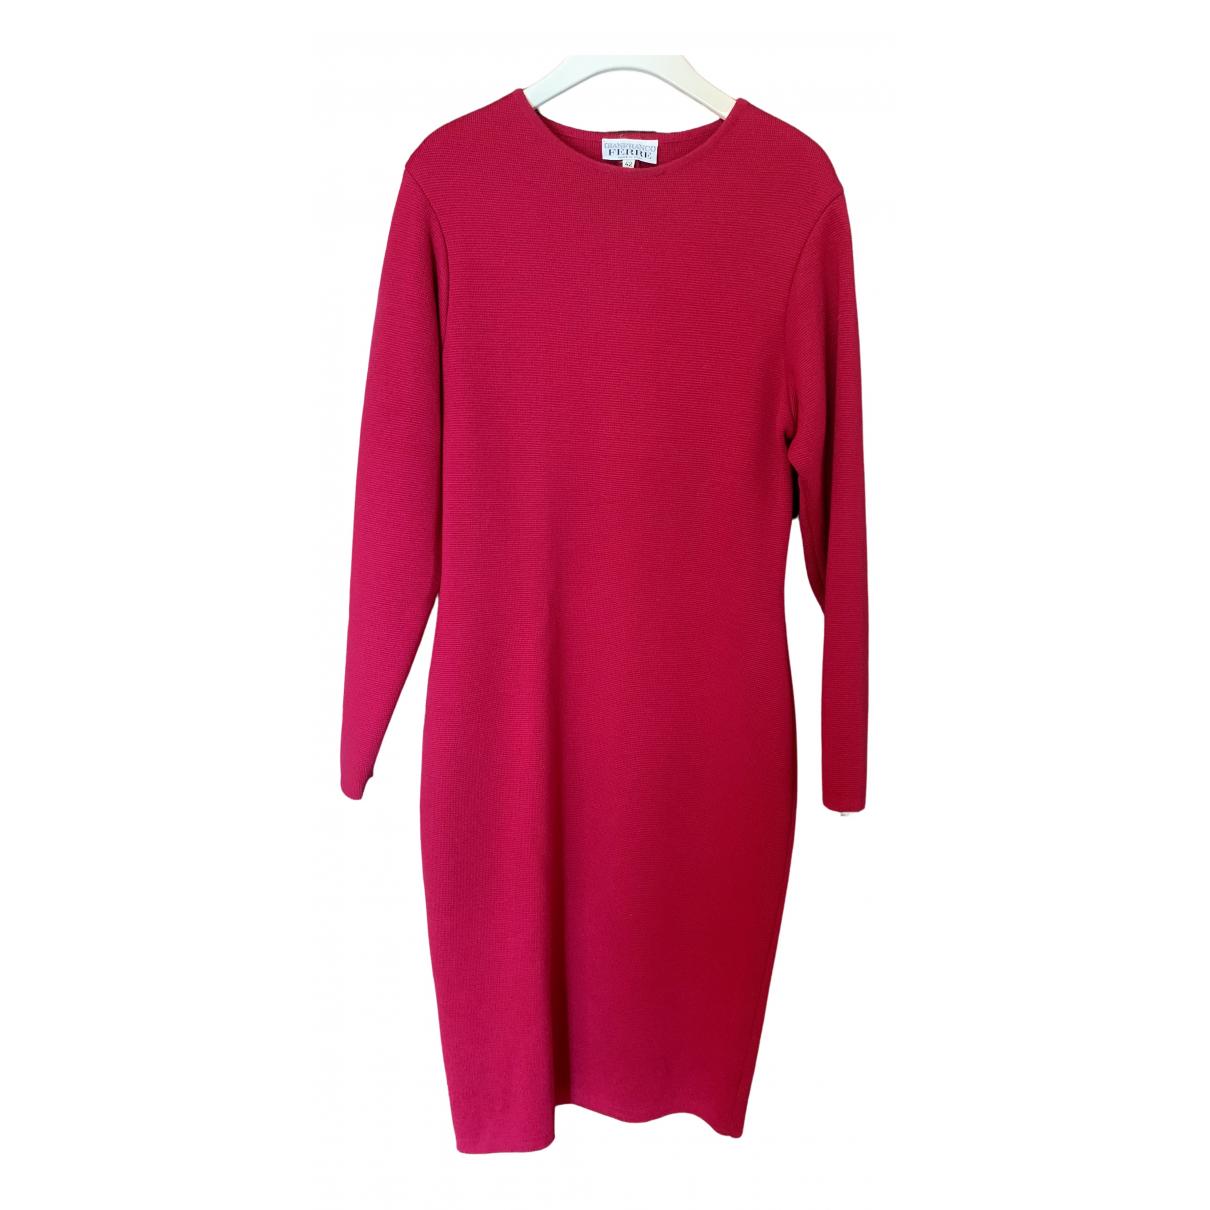 Gianfranco Ferre \N Kleid in  Rot Wolle